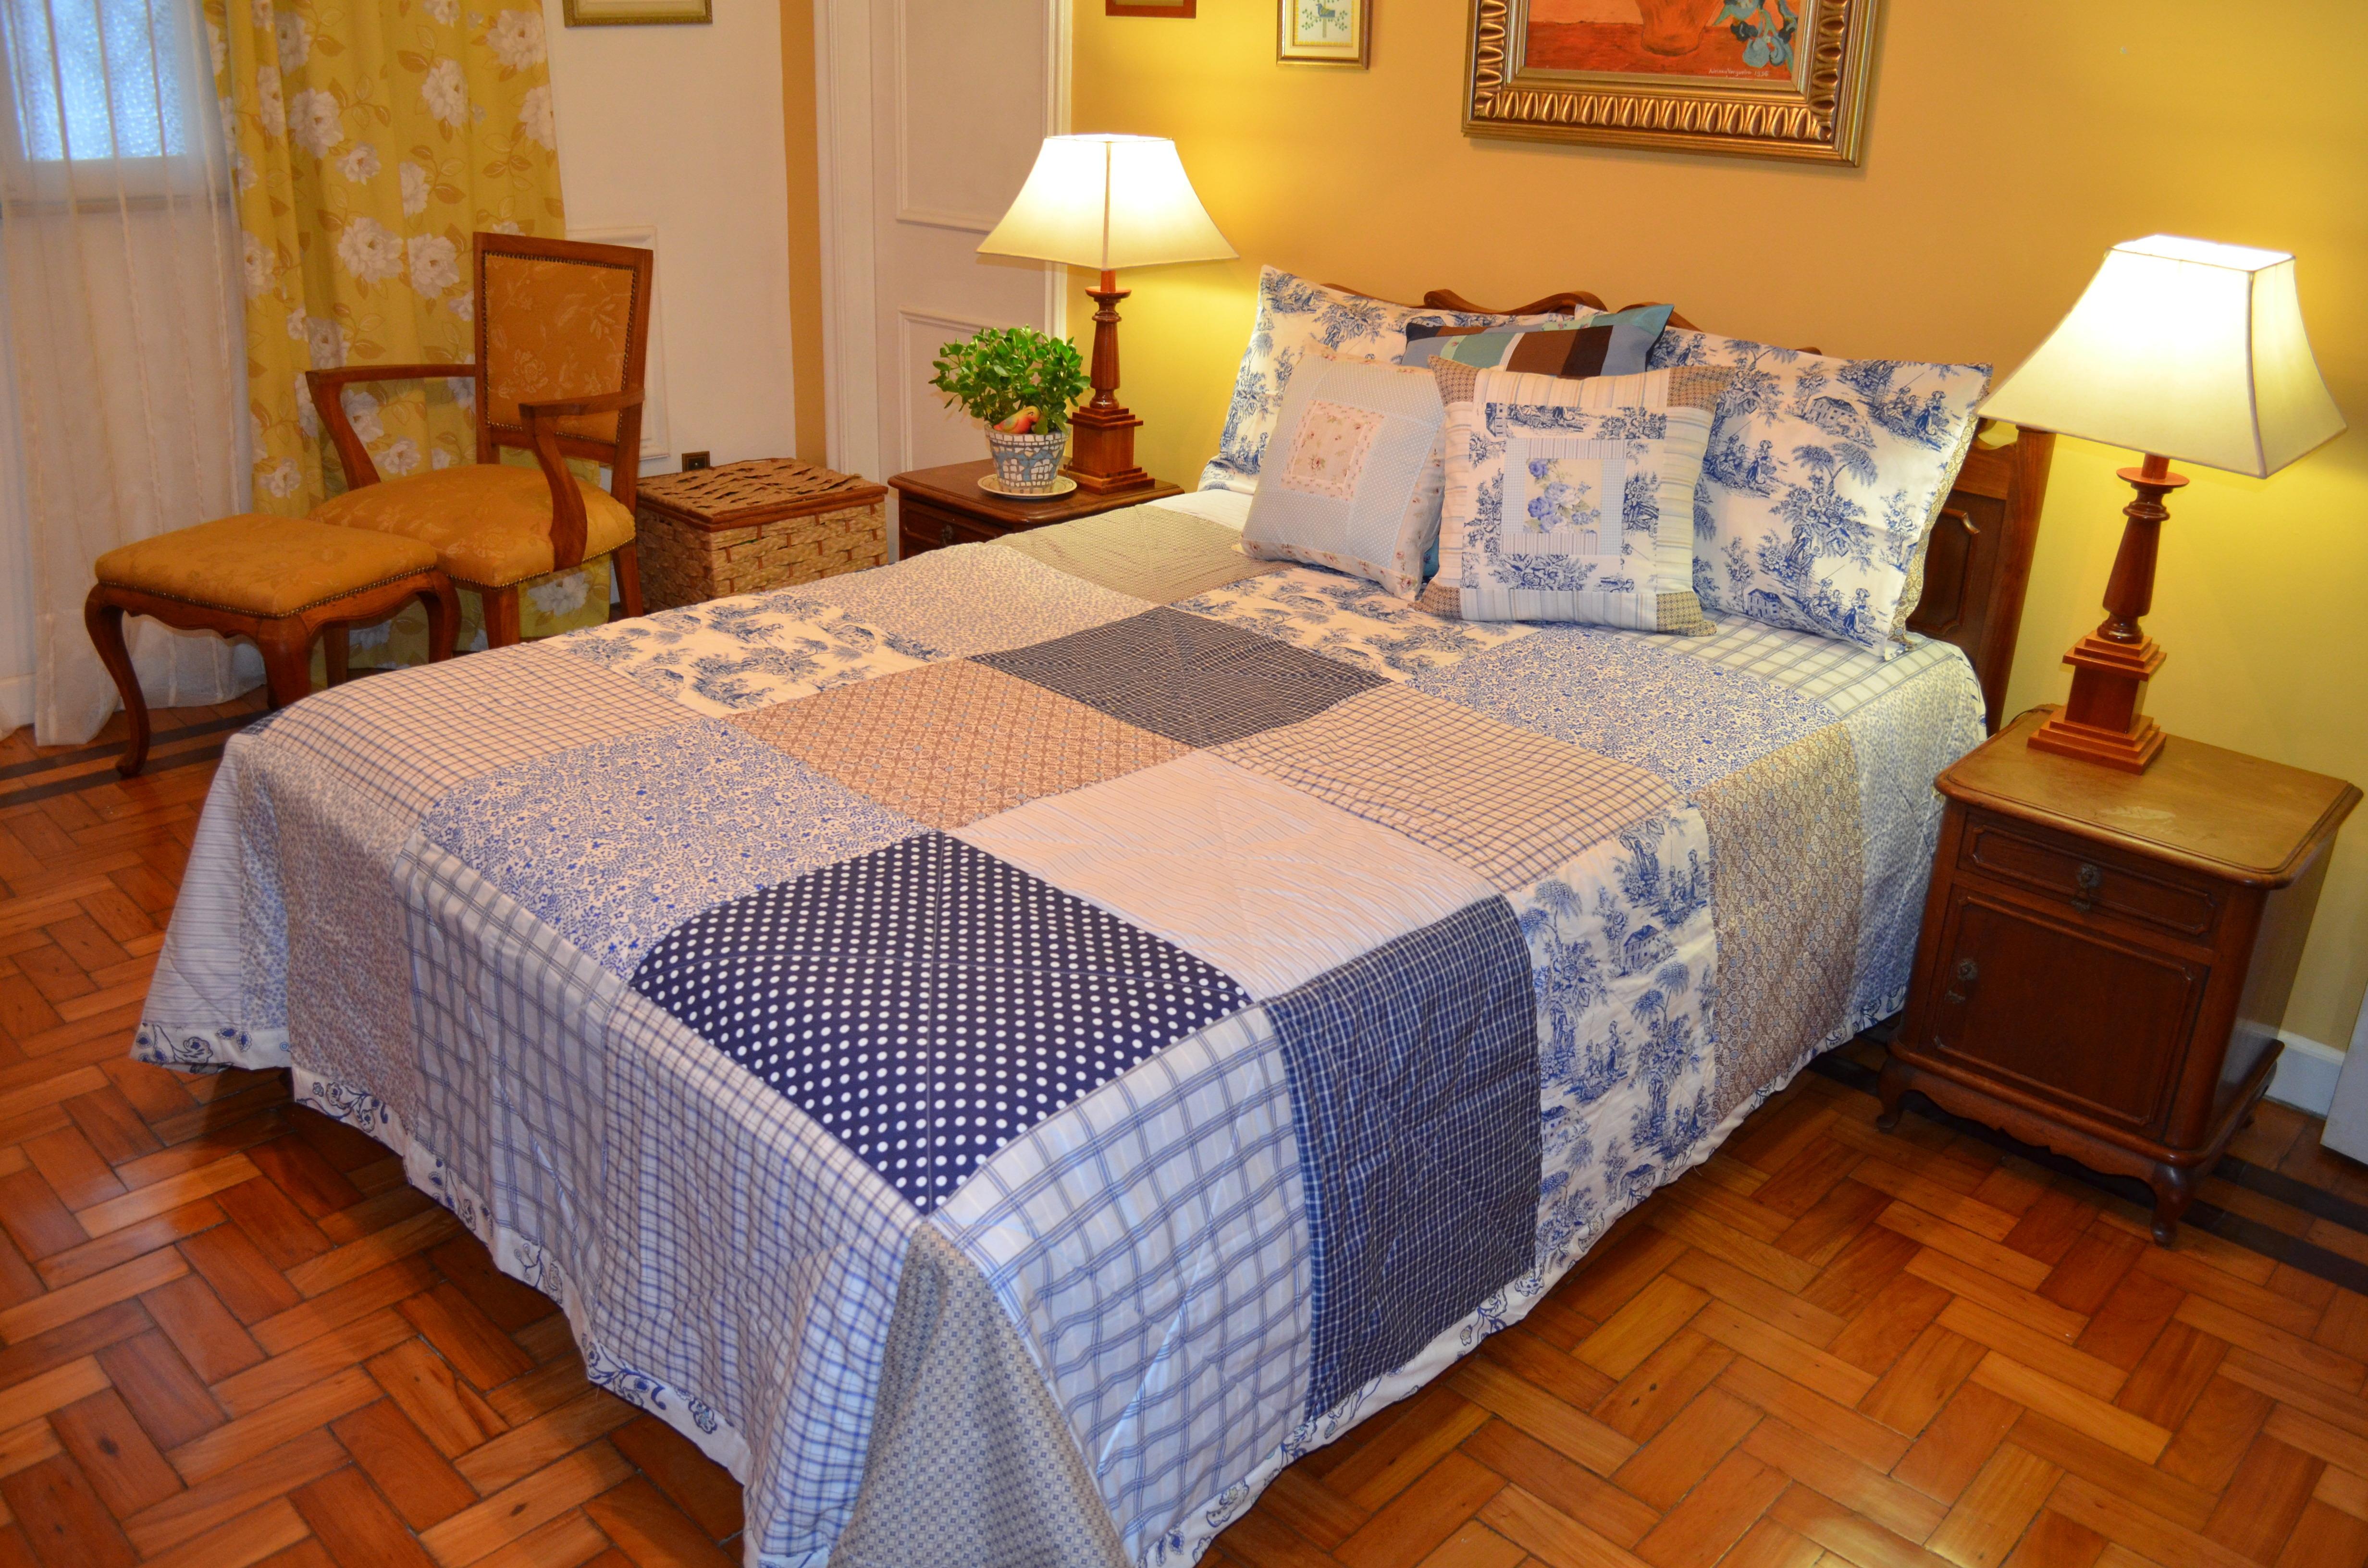 Ropa de cama tumblr - Colcha patchwork ...